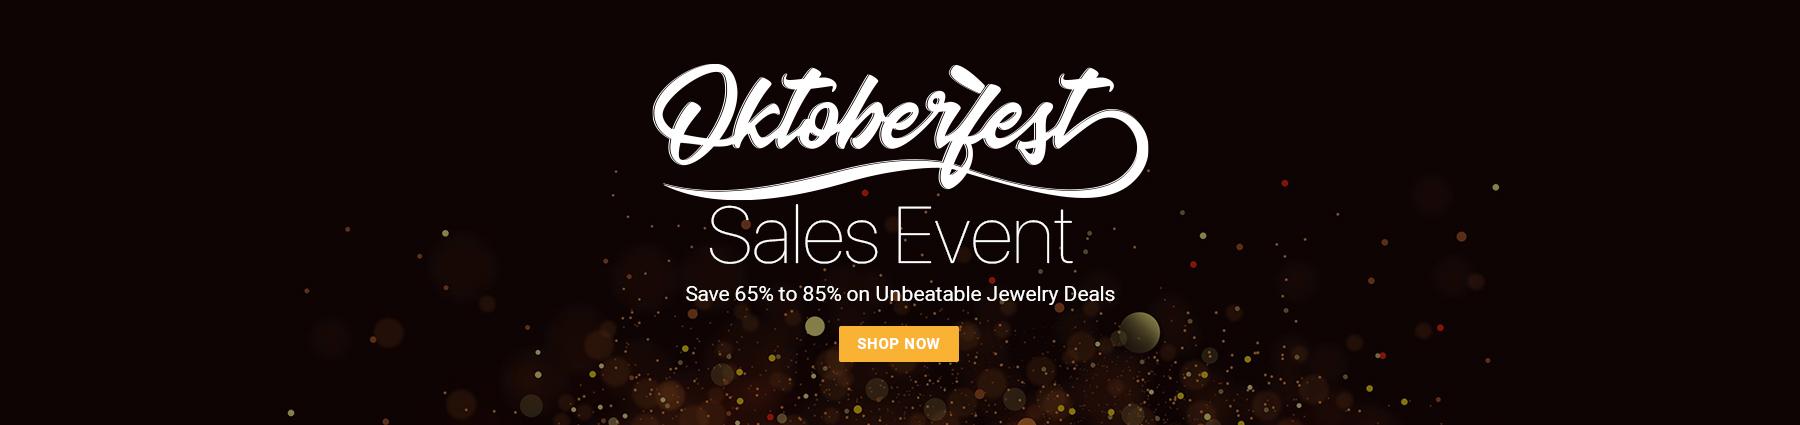 Oktoberfest Jewelry Deals